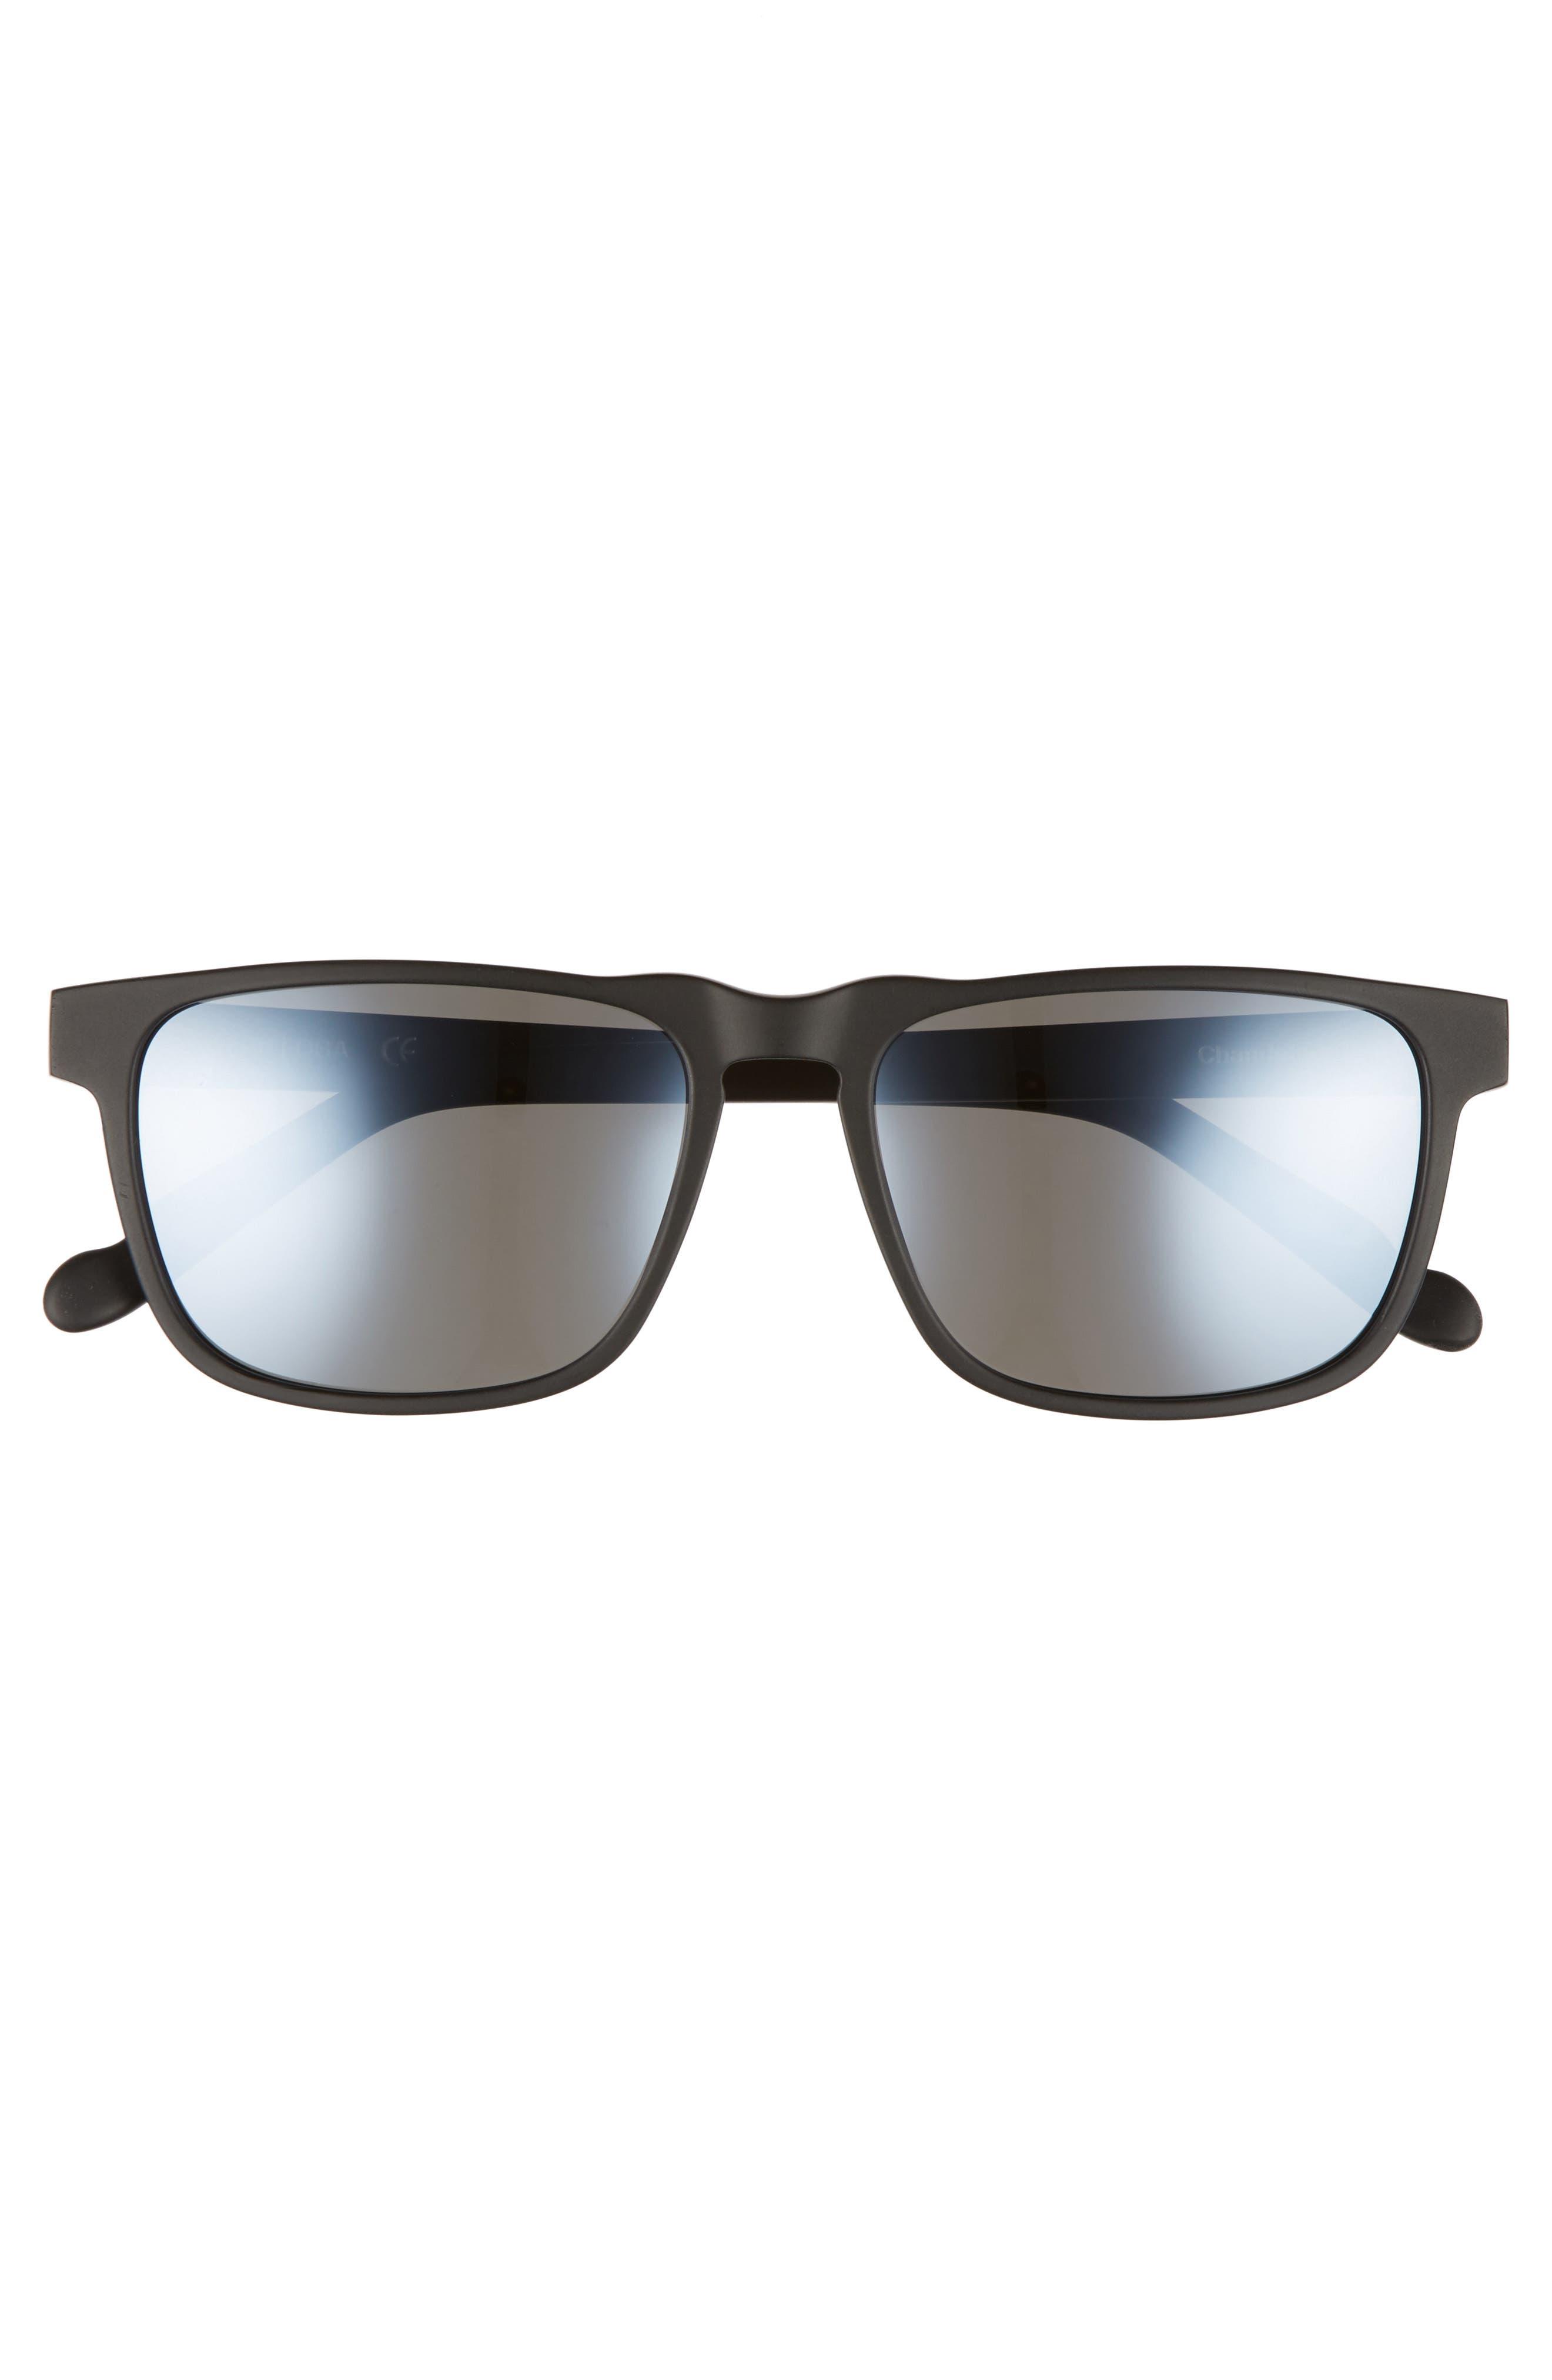 Chandeleur 59mm Polarized Aviator Sunglasses,                             Alternate thumbnail 3, color,                             020